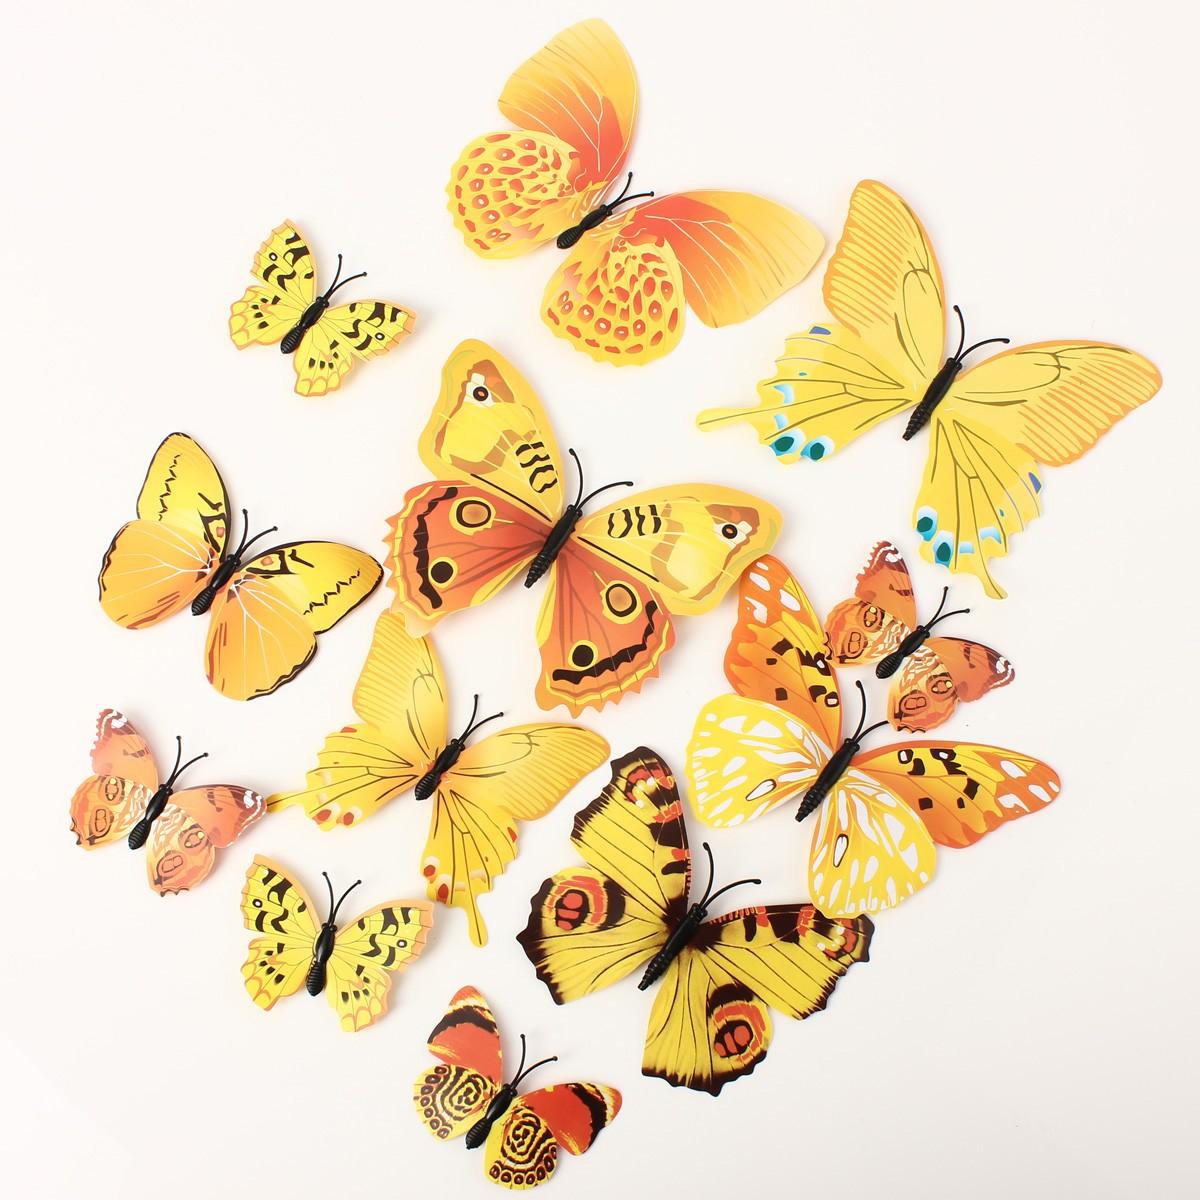 12pcs papillon sticker 3d d coration mariage mural salon diy pingle aimant uk ebay. Black Bedroom Furniture Sets. Home Design Ideas